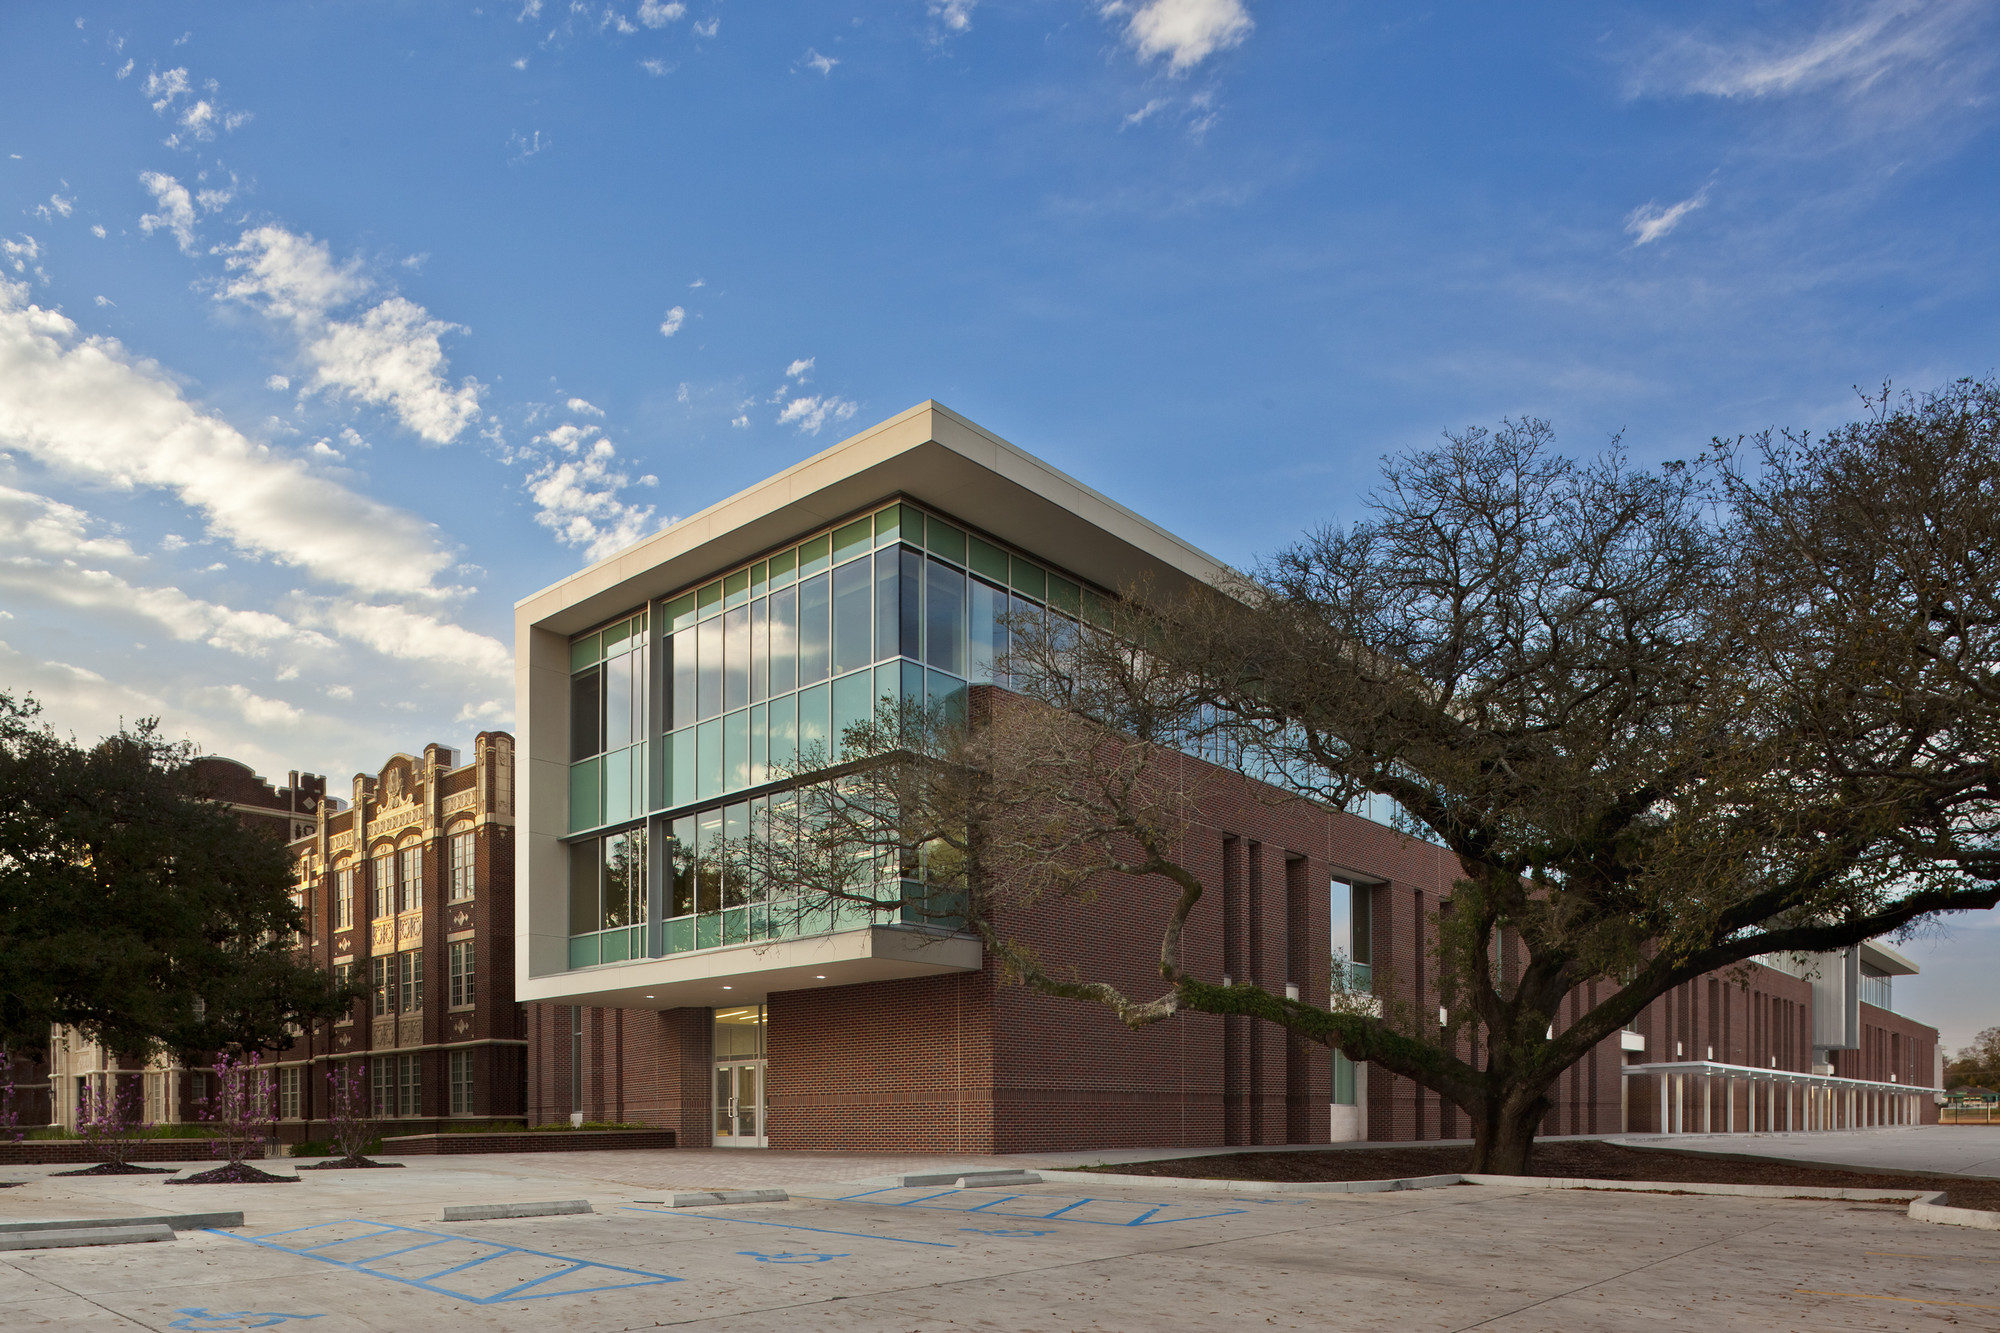 Baton Rouge Magnet High School / Chenevert Architects + Remson|Haley|Herpin Architects, © Sean Calamia